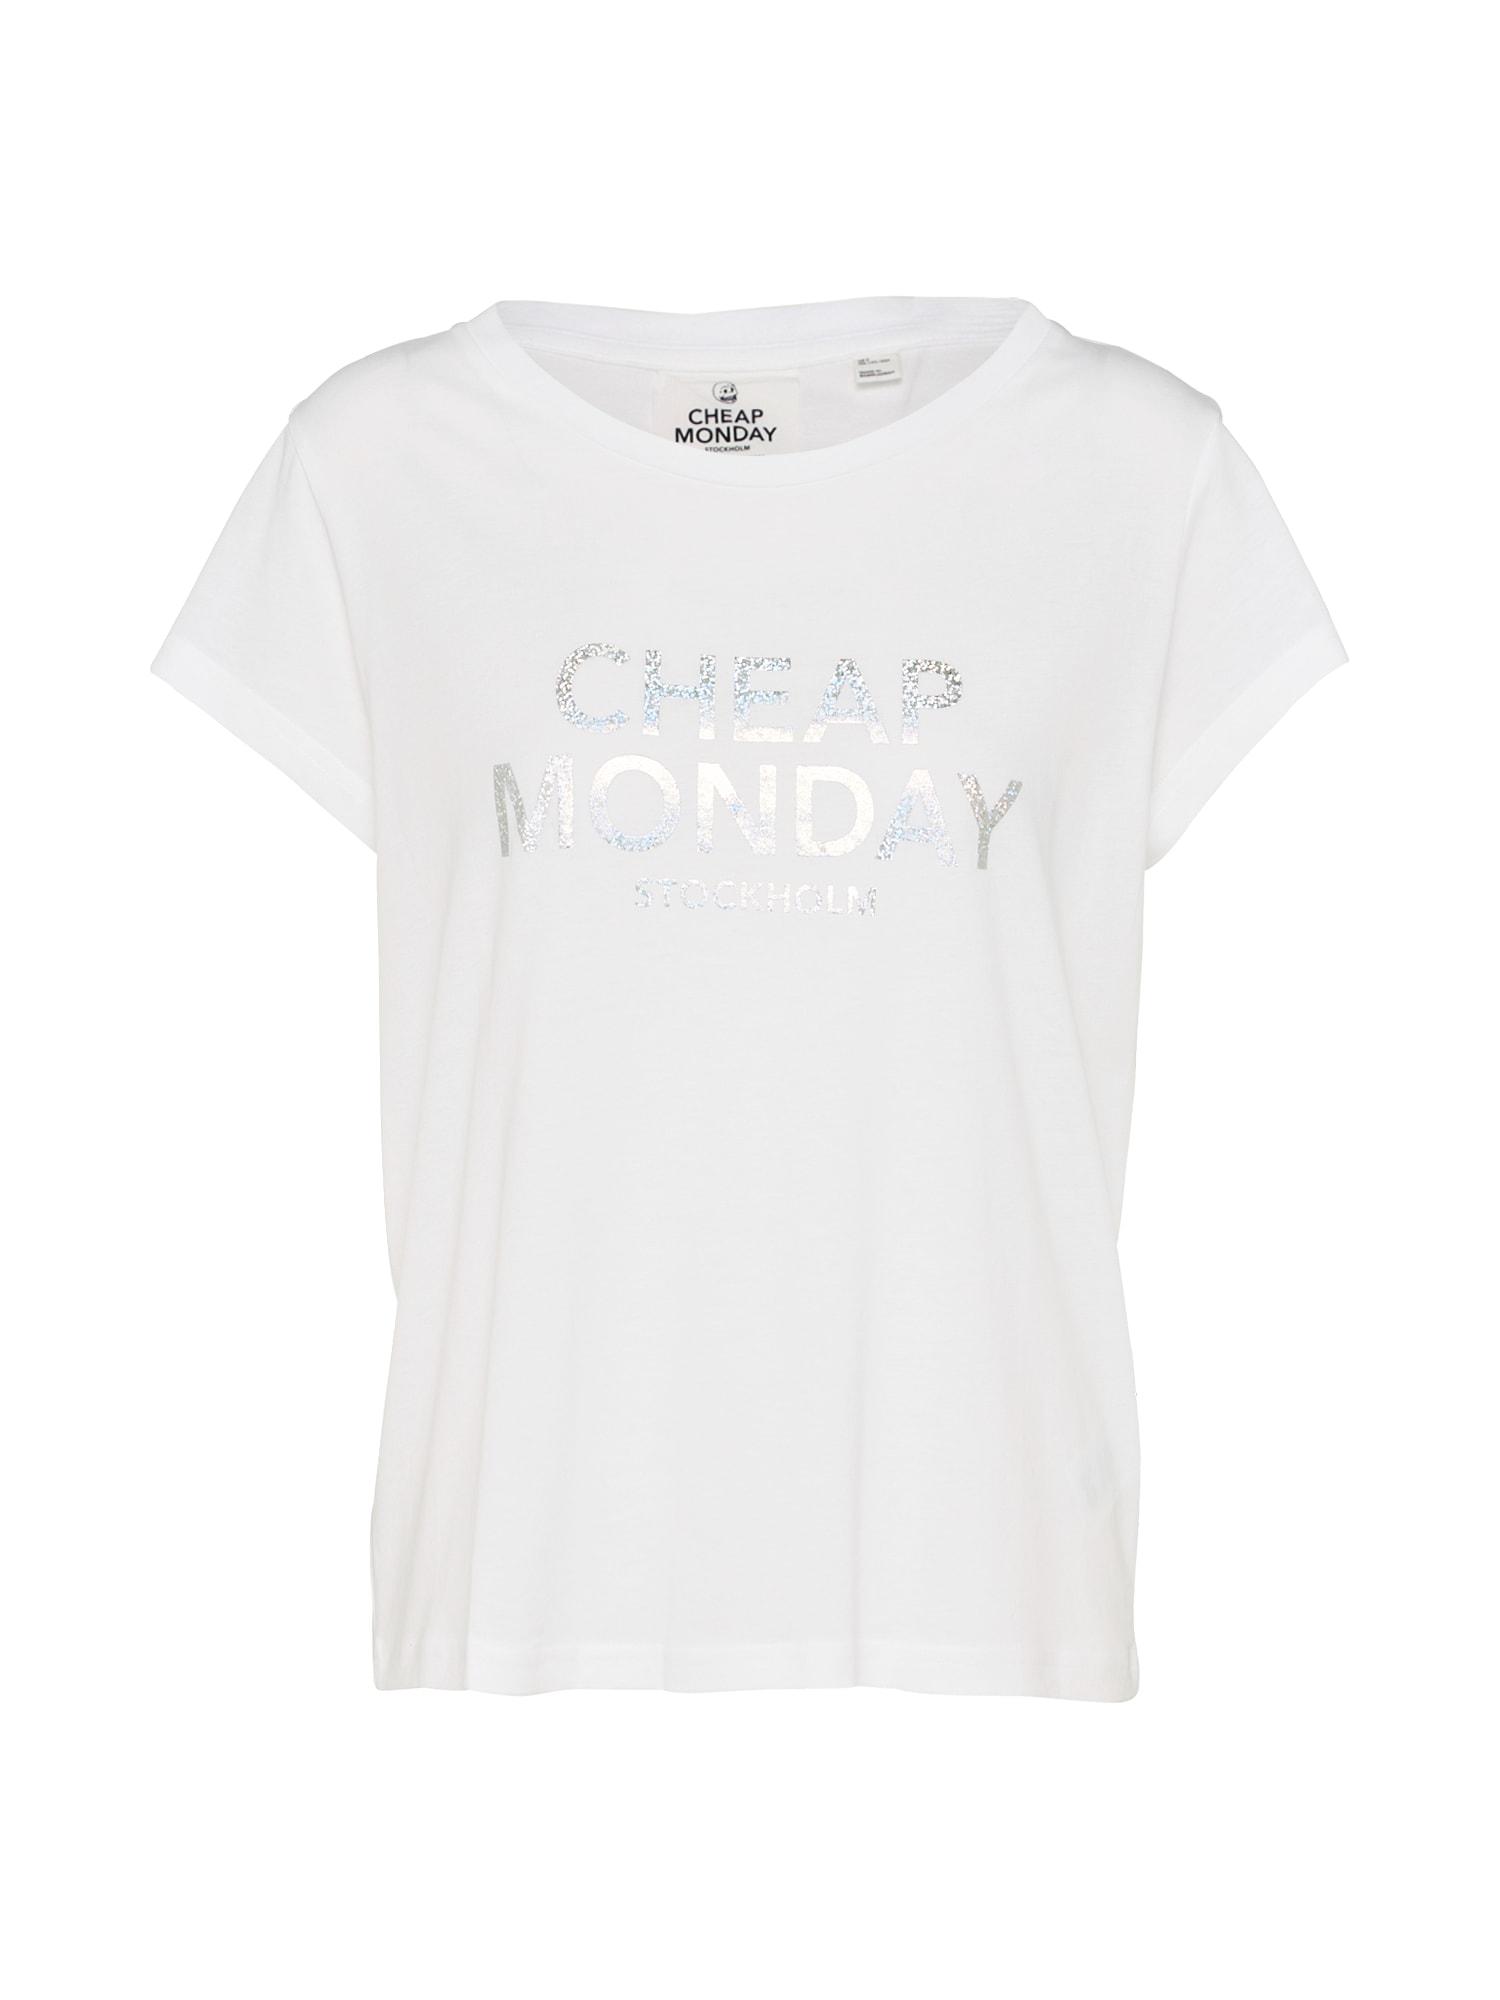 CHEAP MONDAY Dames Shirt Have tee Foil logo wit